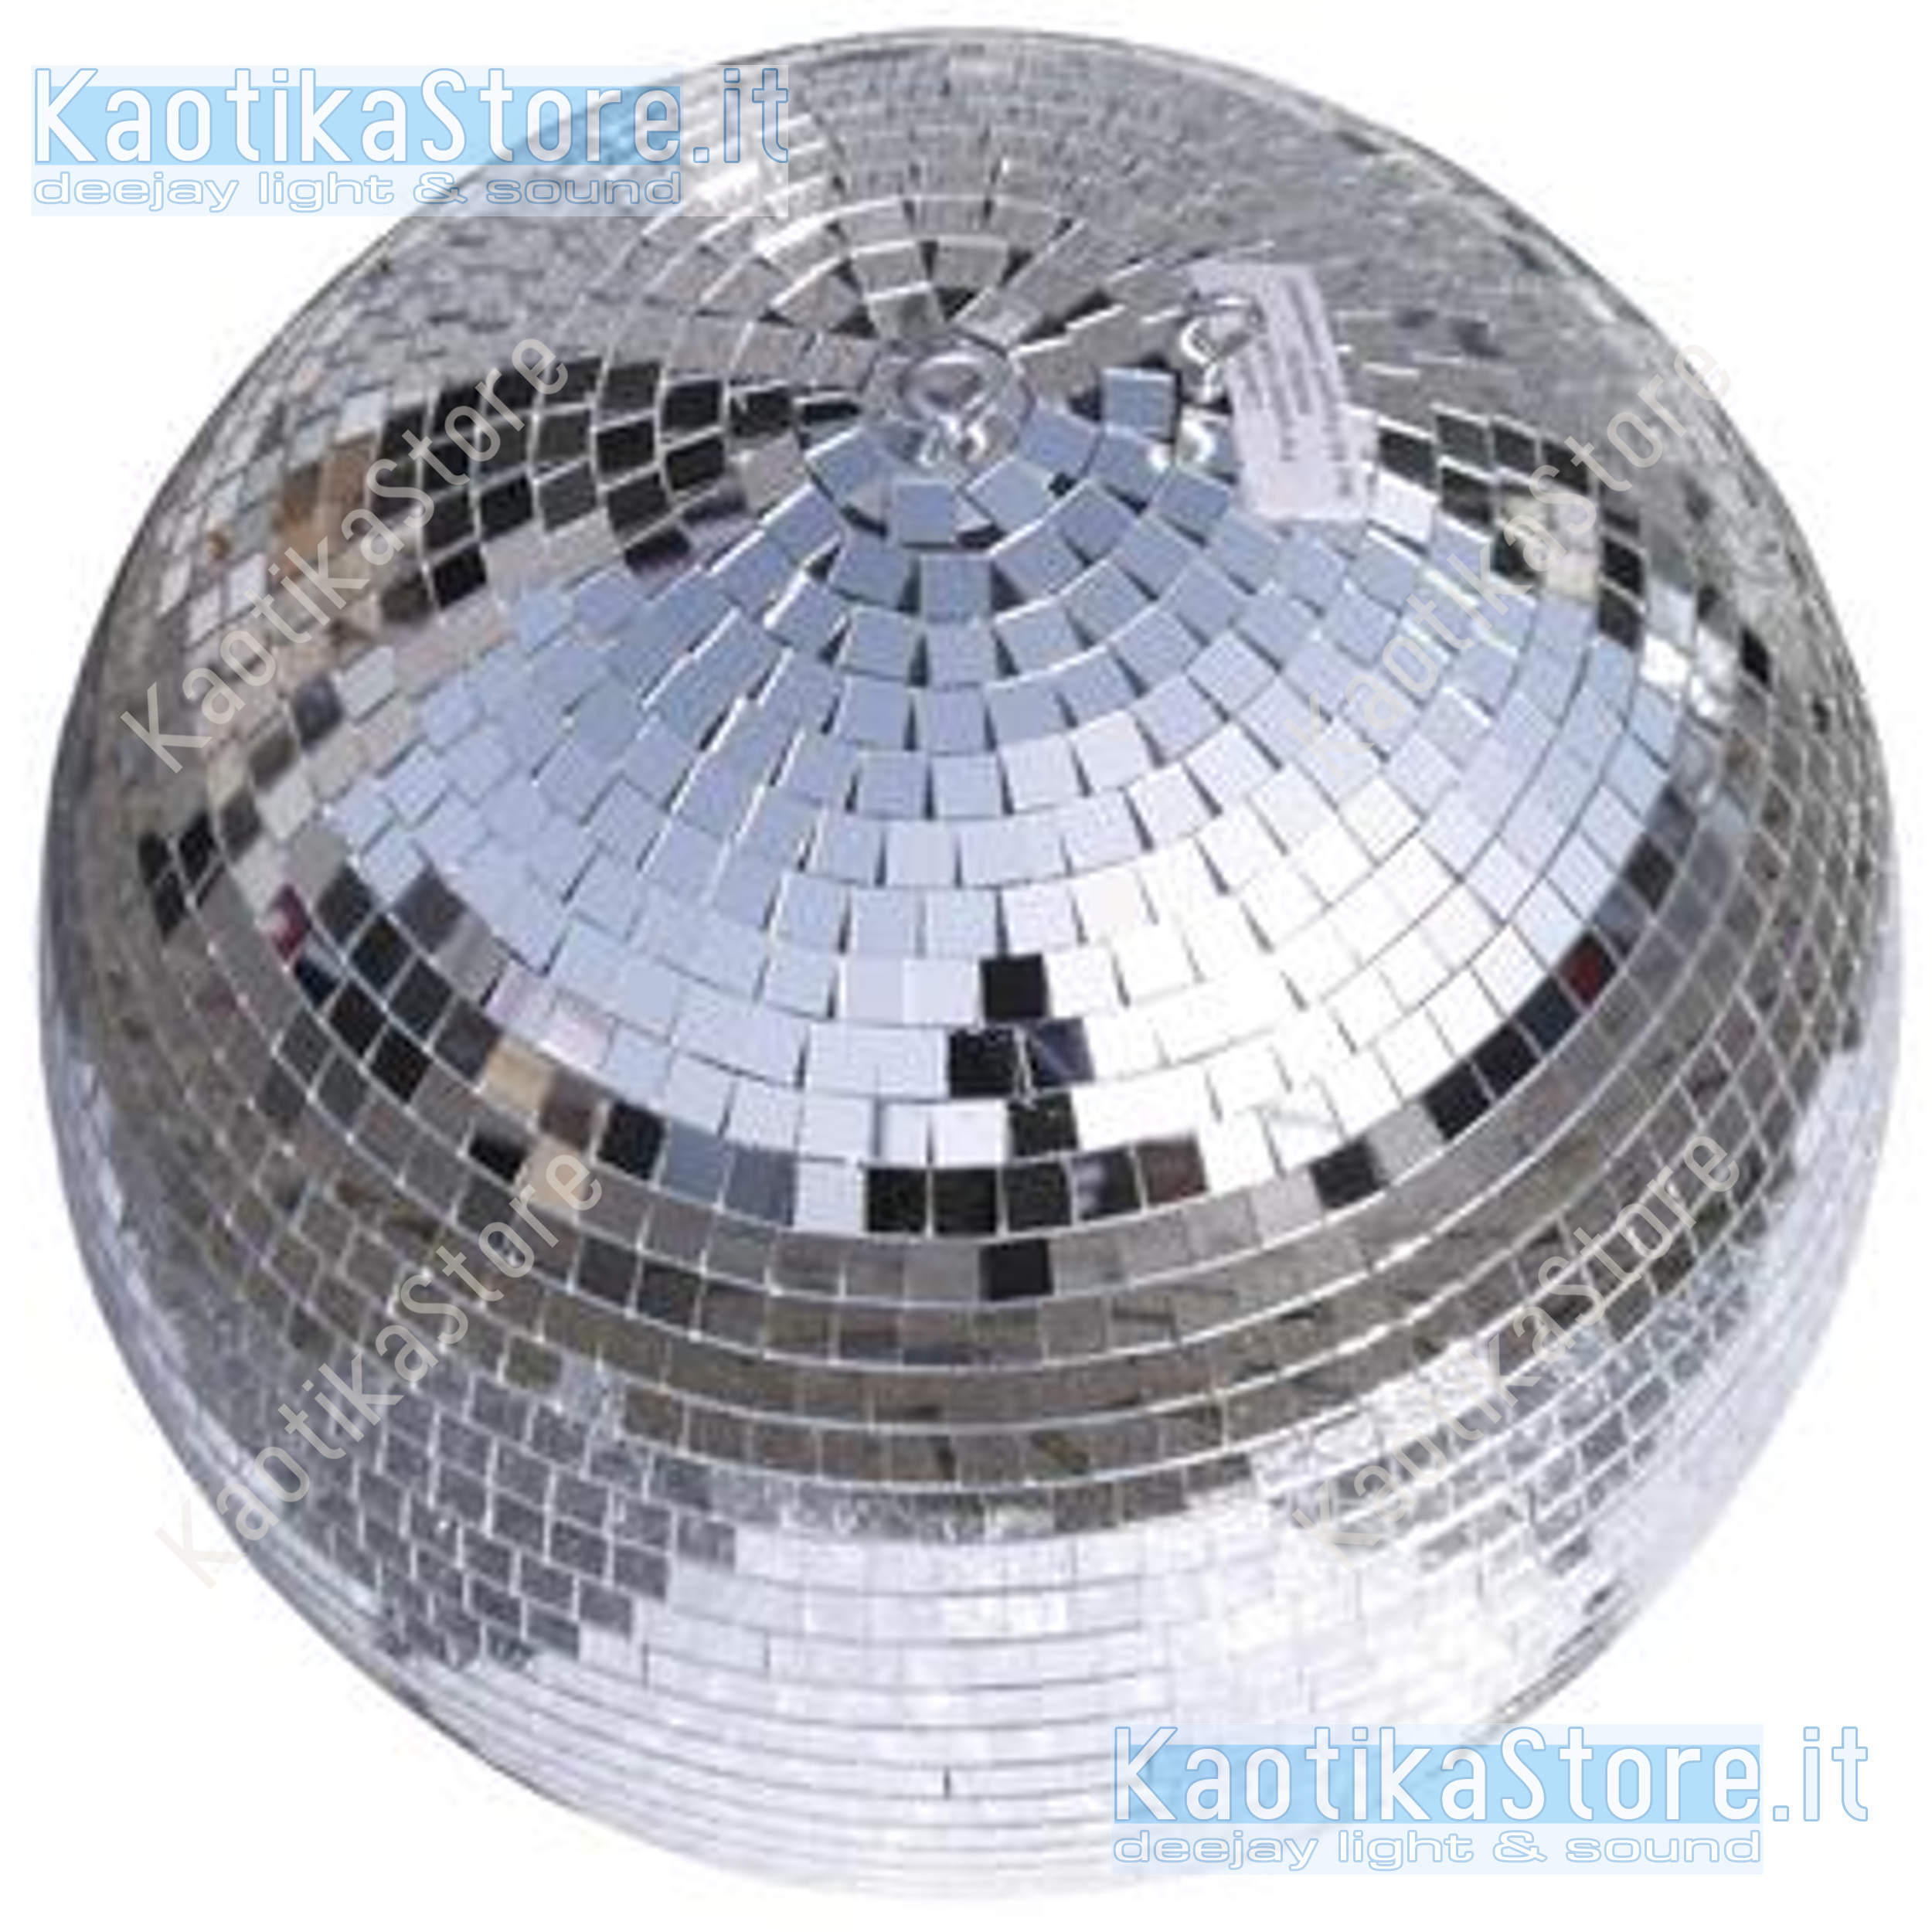 Luci Da Discoteca Fai Da Te.Palla 40 Cm Motore Per Discoteca Sfera Vetri Specchi Feste Luce